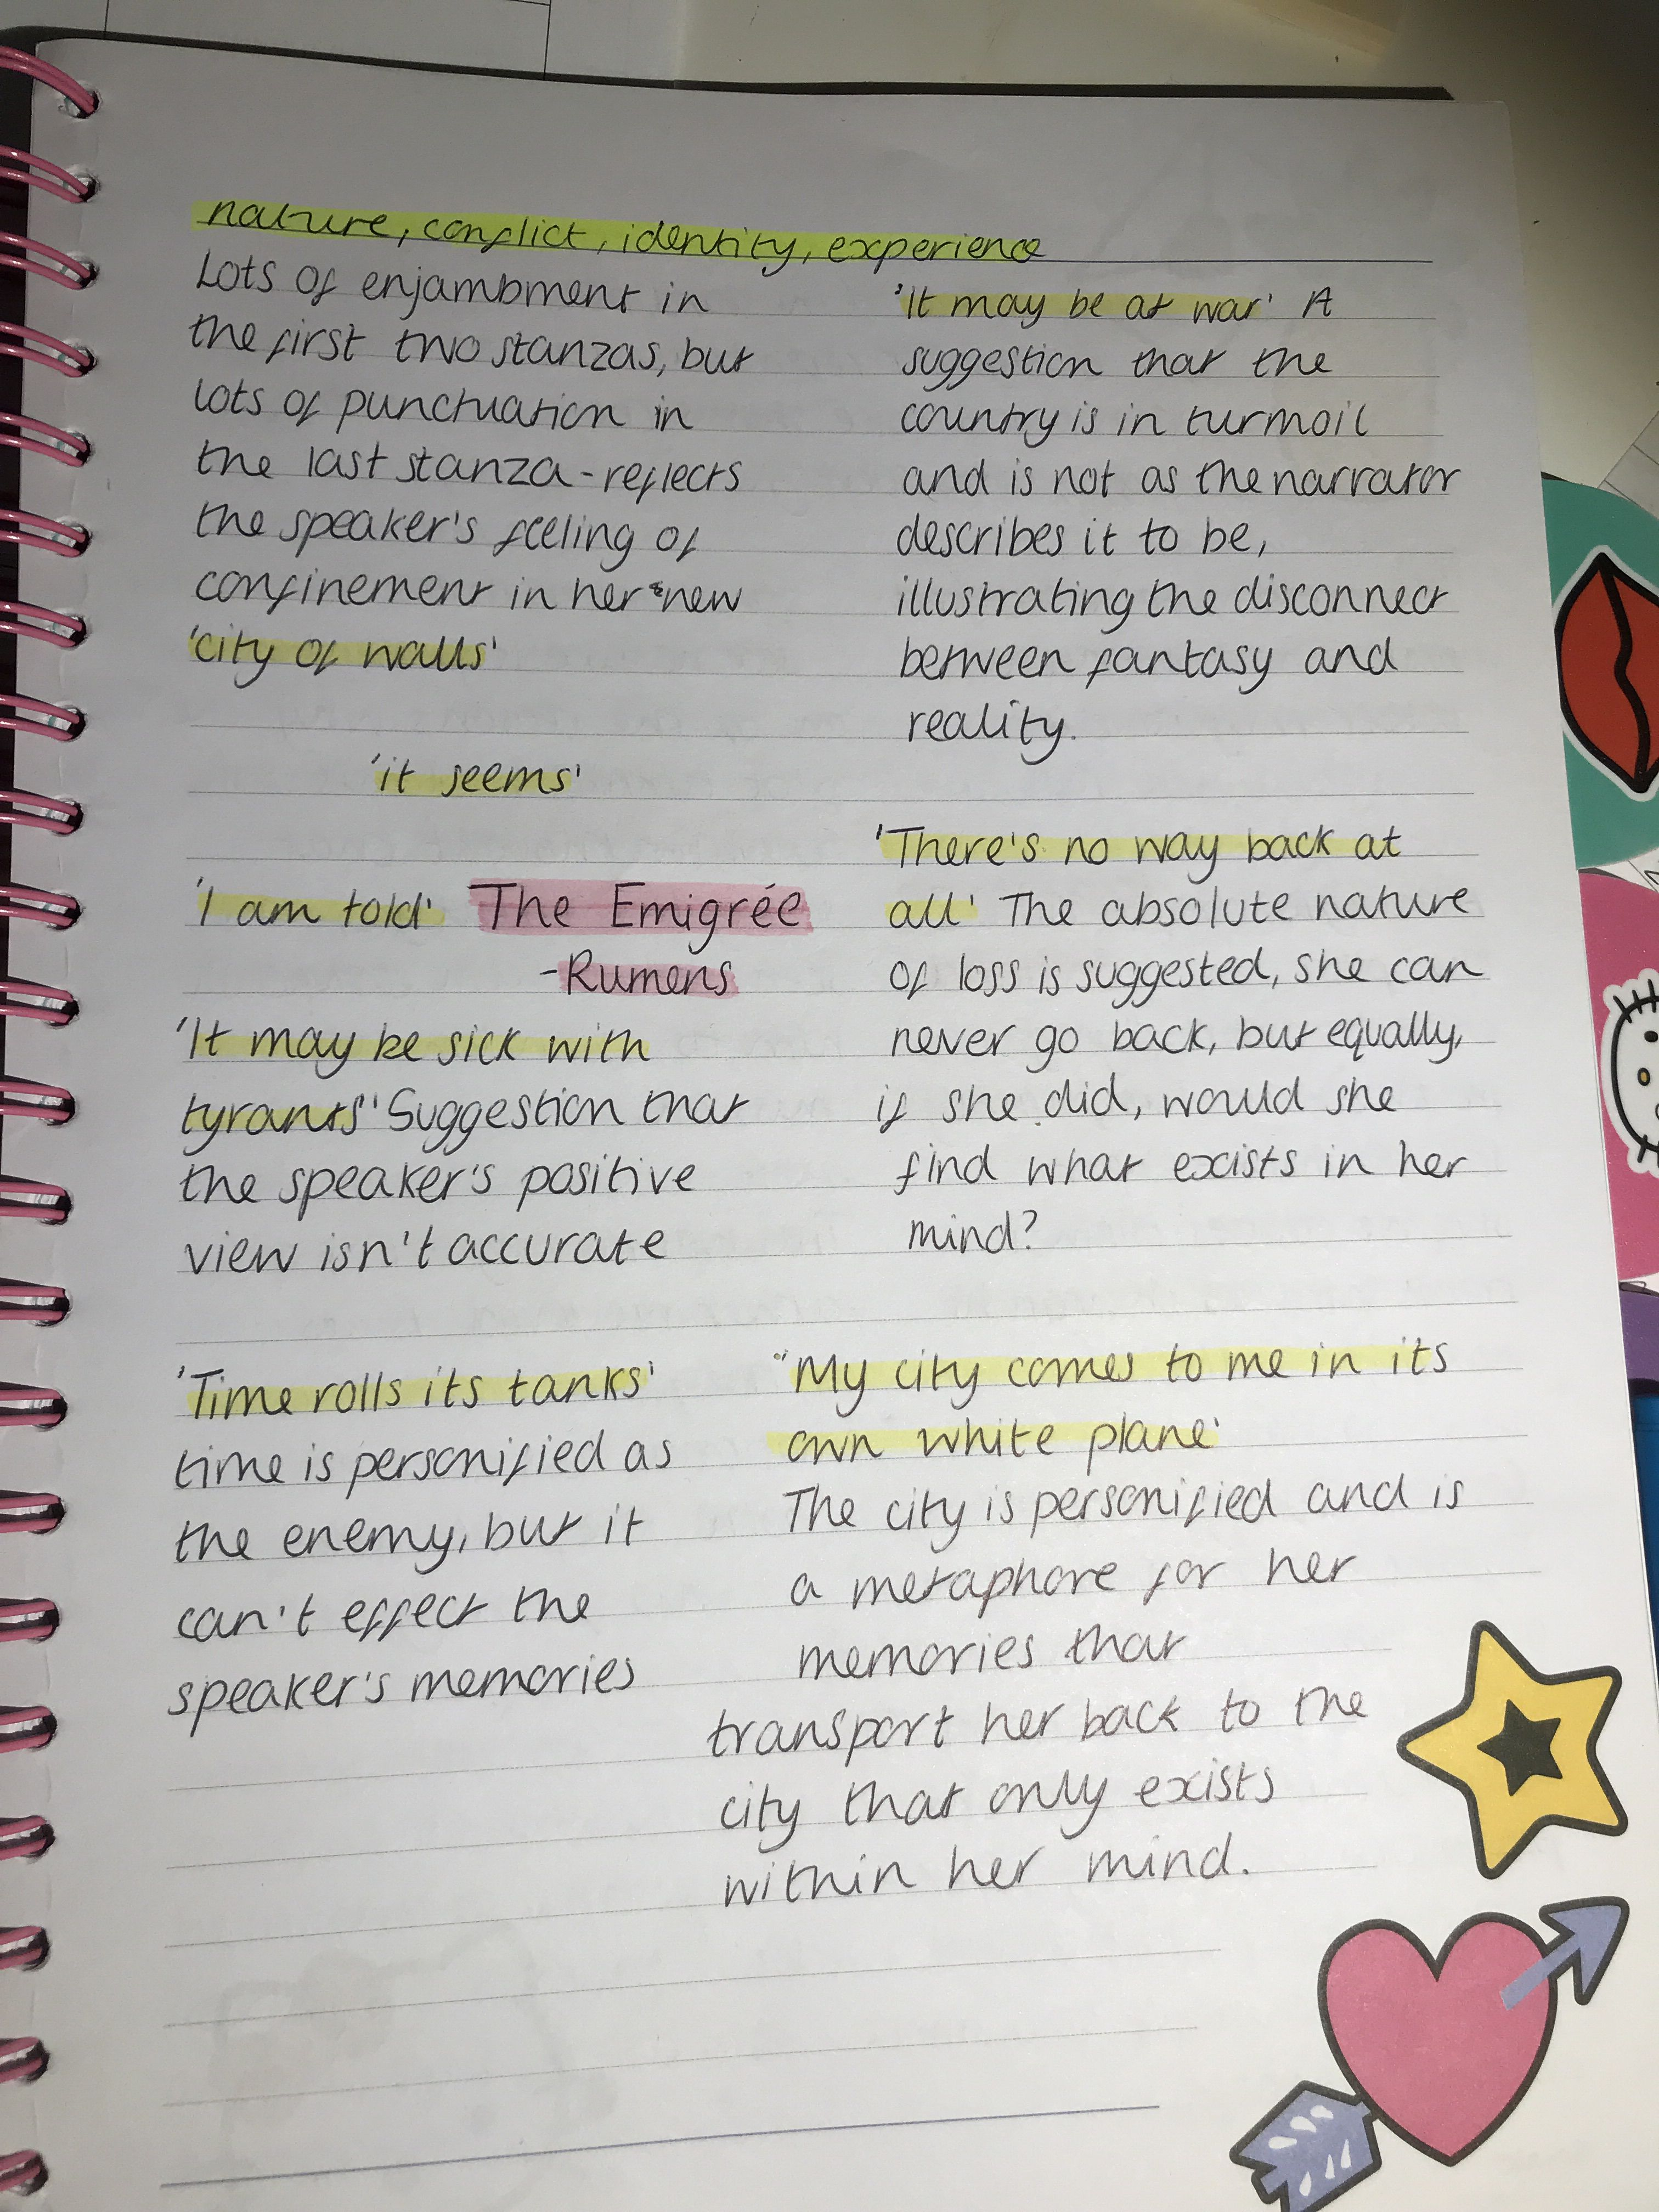 Gcse English Lit The Emigree Poem With Images